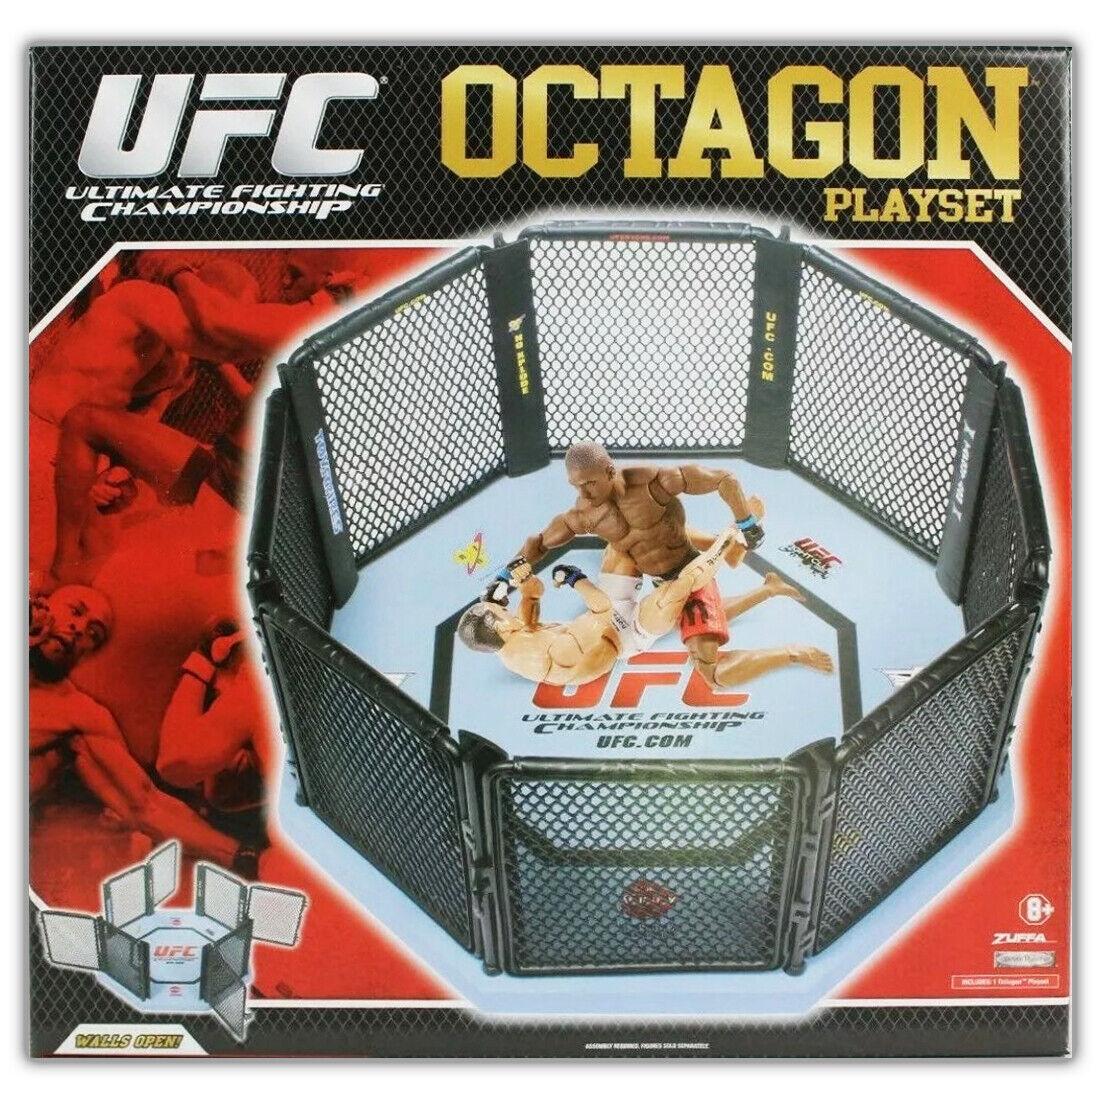 UFC OCTAGON PLAYSET Jakks Pacific azione cifras DAMAGED PACKAGING MMA WWE AEW